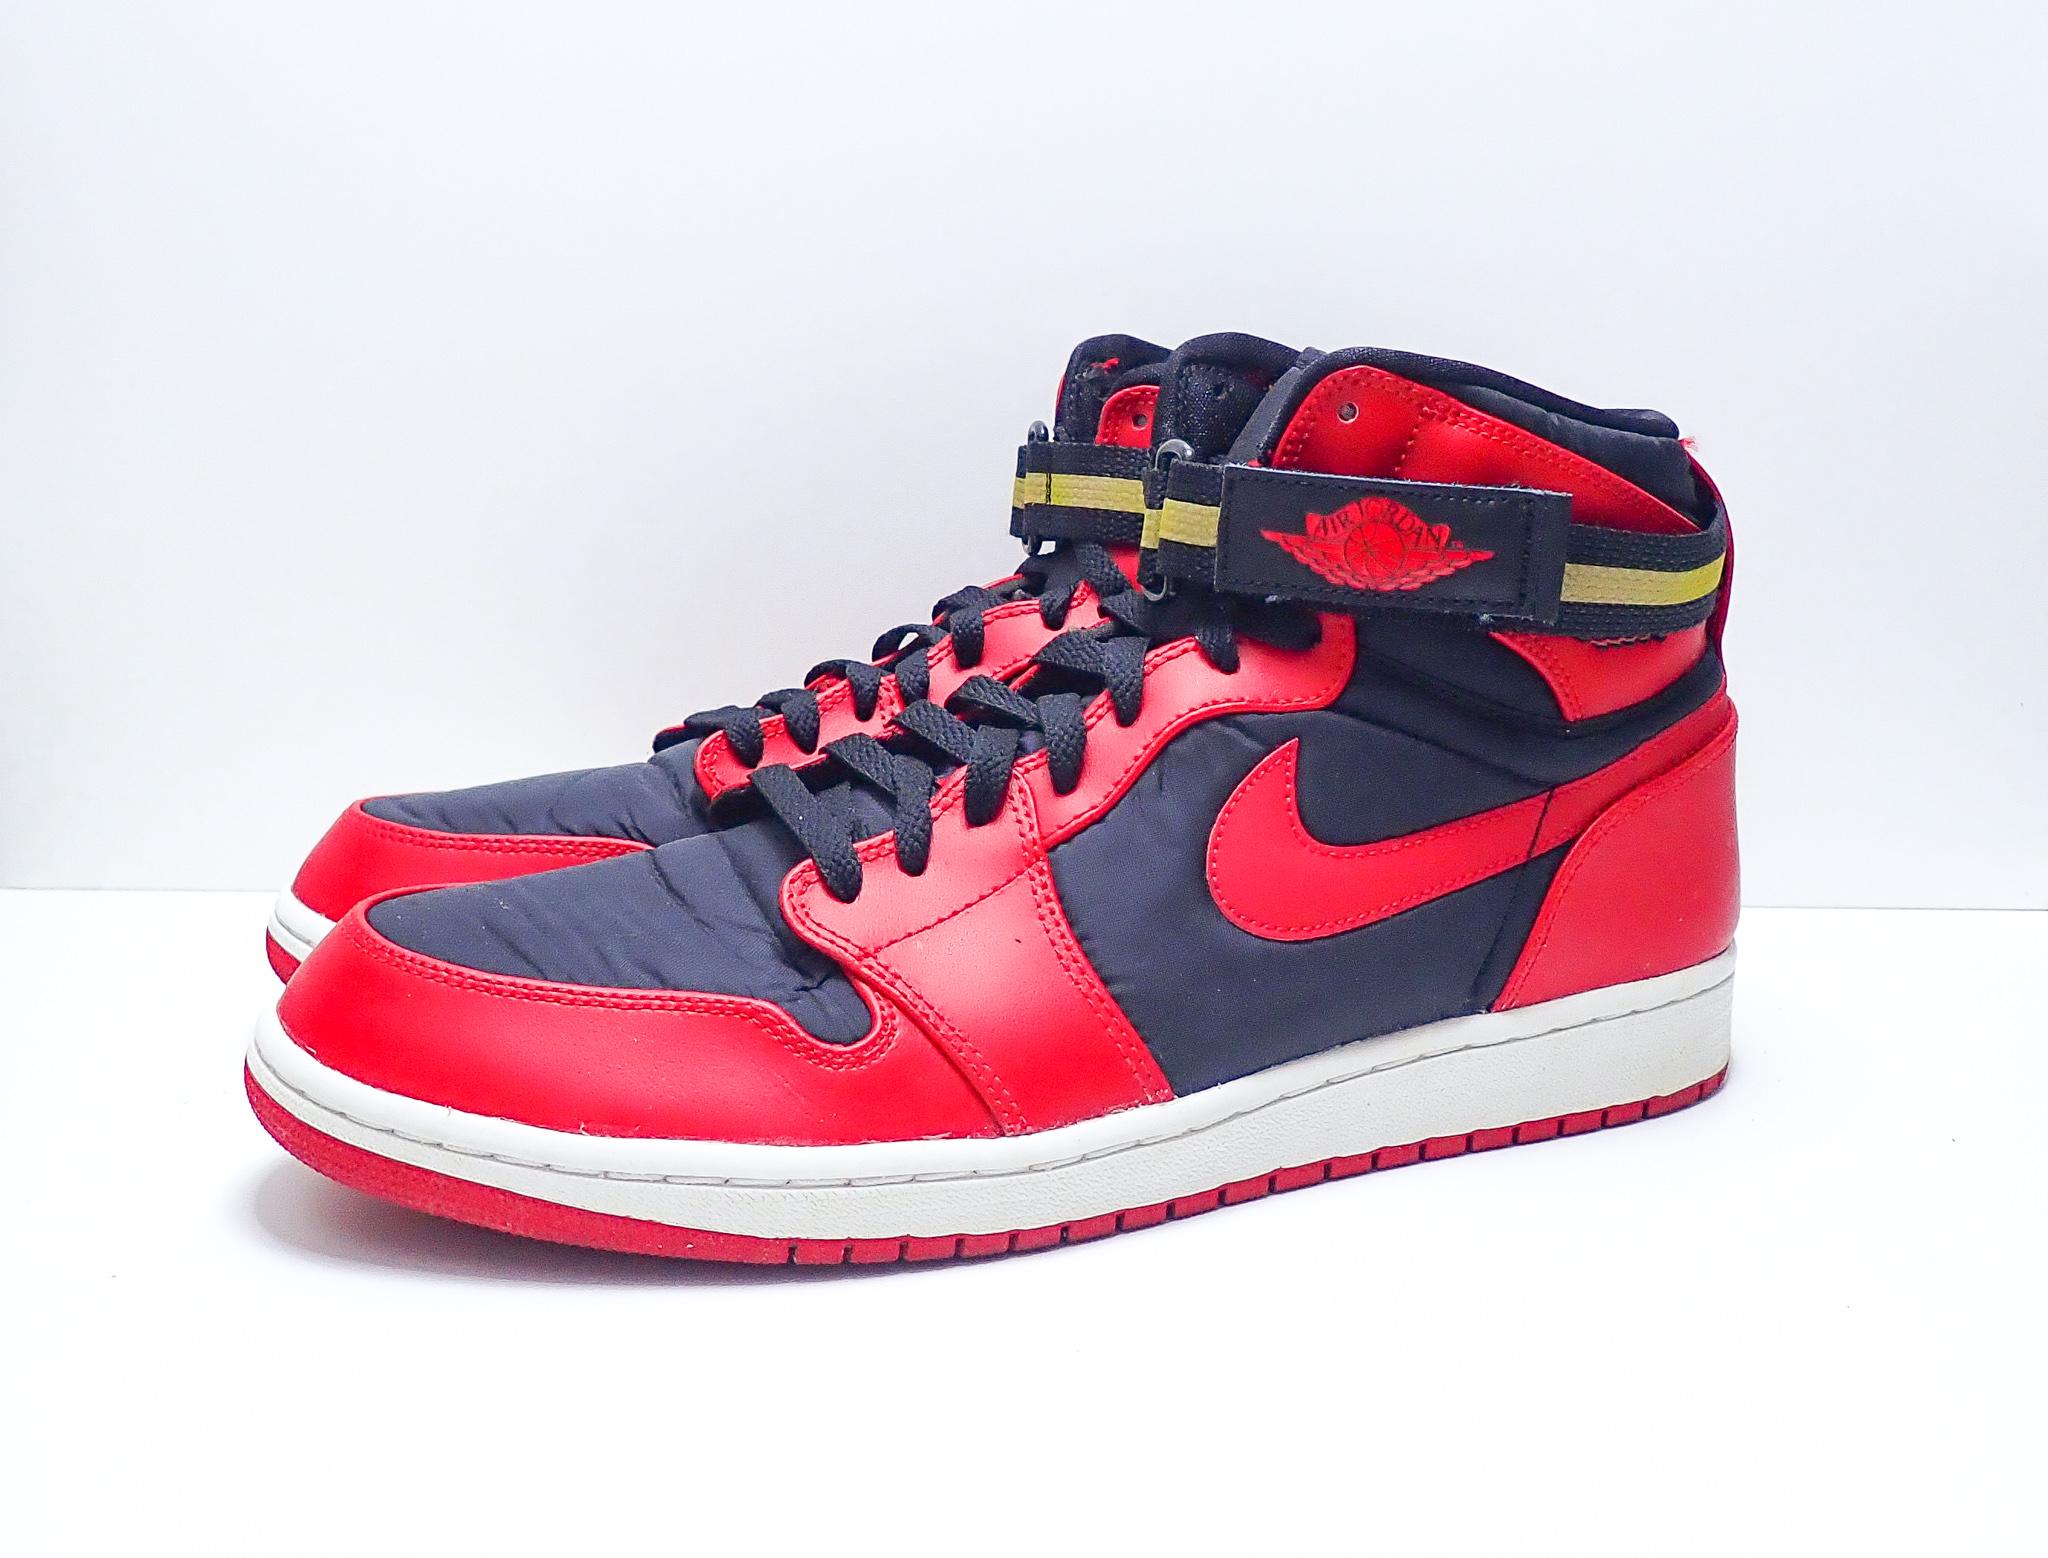 Jordan 1 Retro High Strap Gym Red